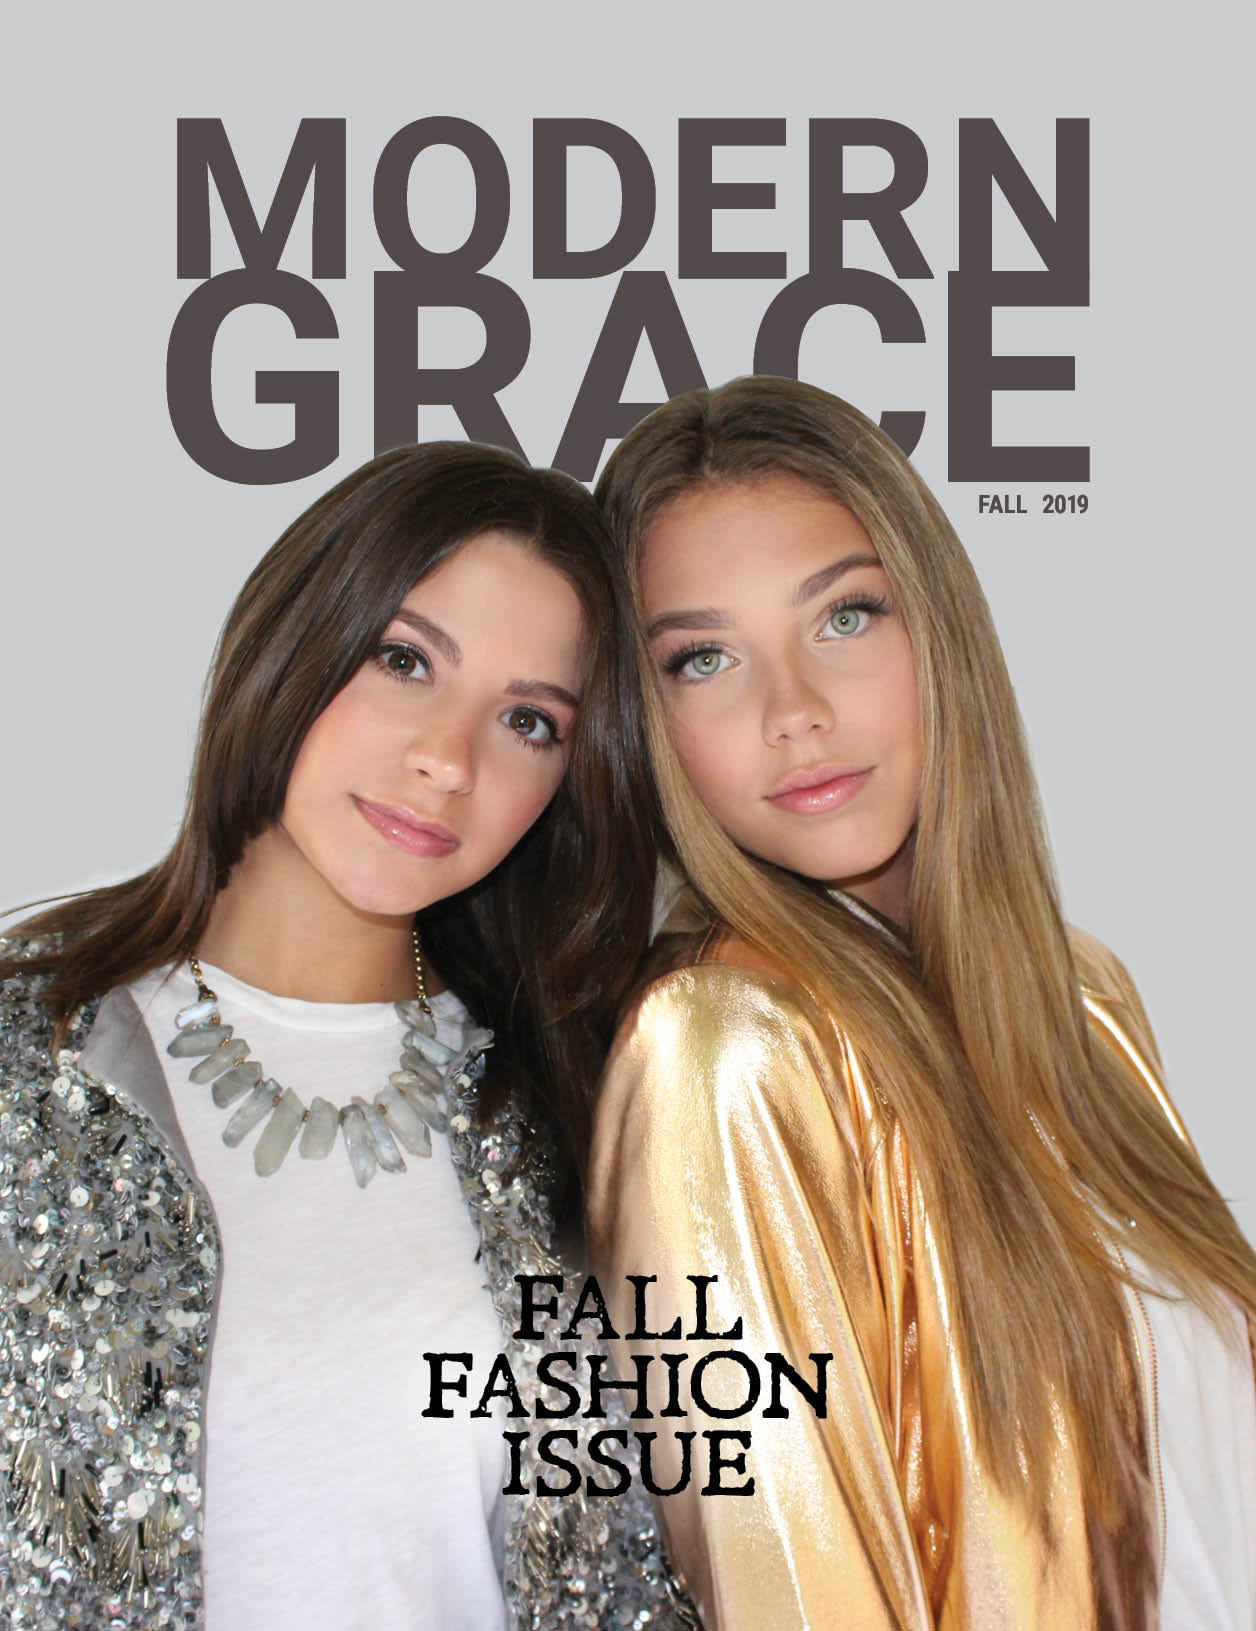 Modern Grace Magazine Fall 2019 Cover (2).jpg